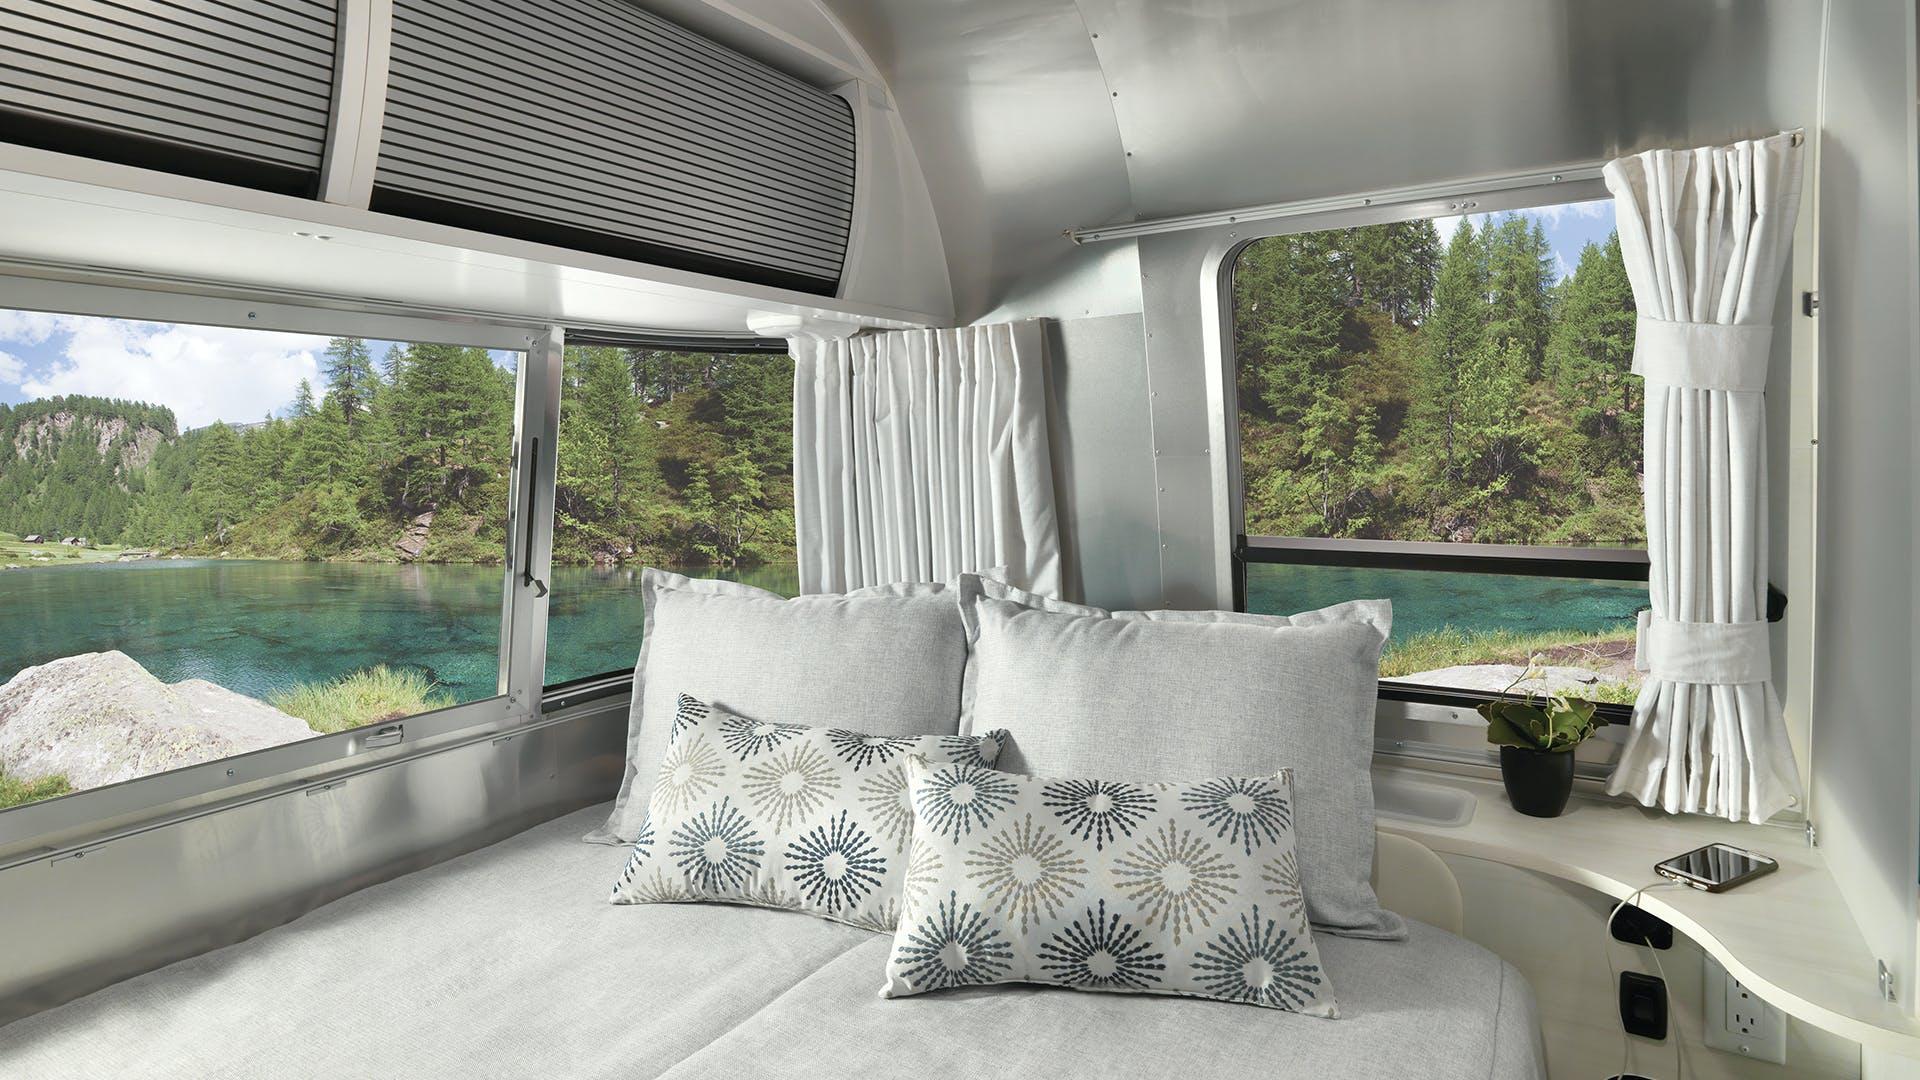 2020 Airstream Bambi Travel Trailer Bed